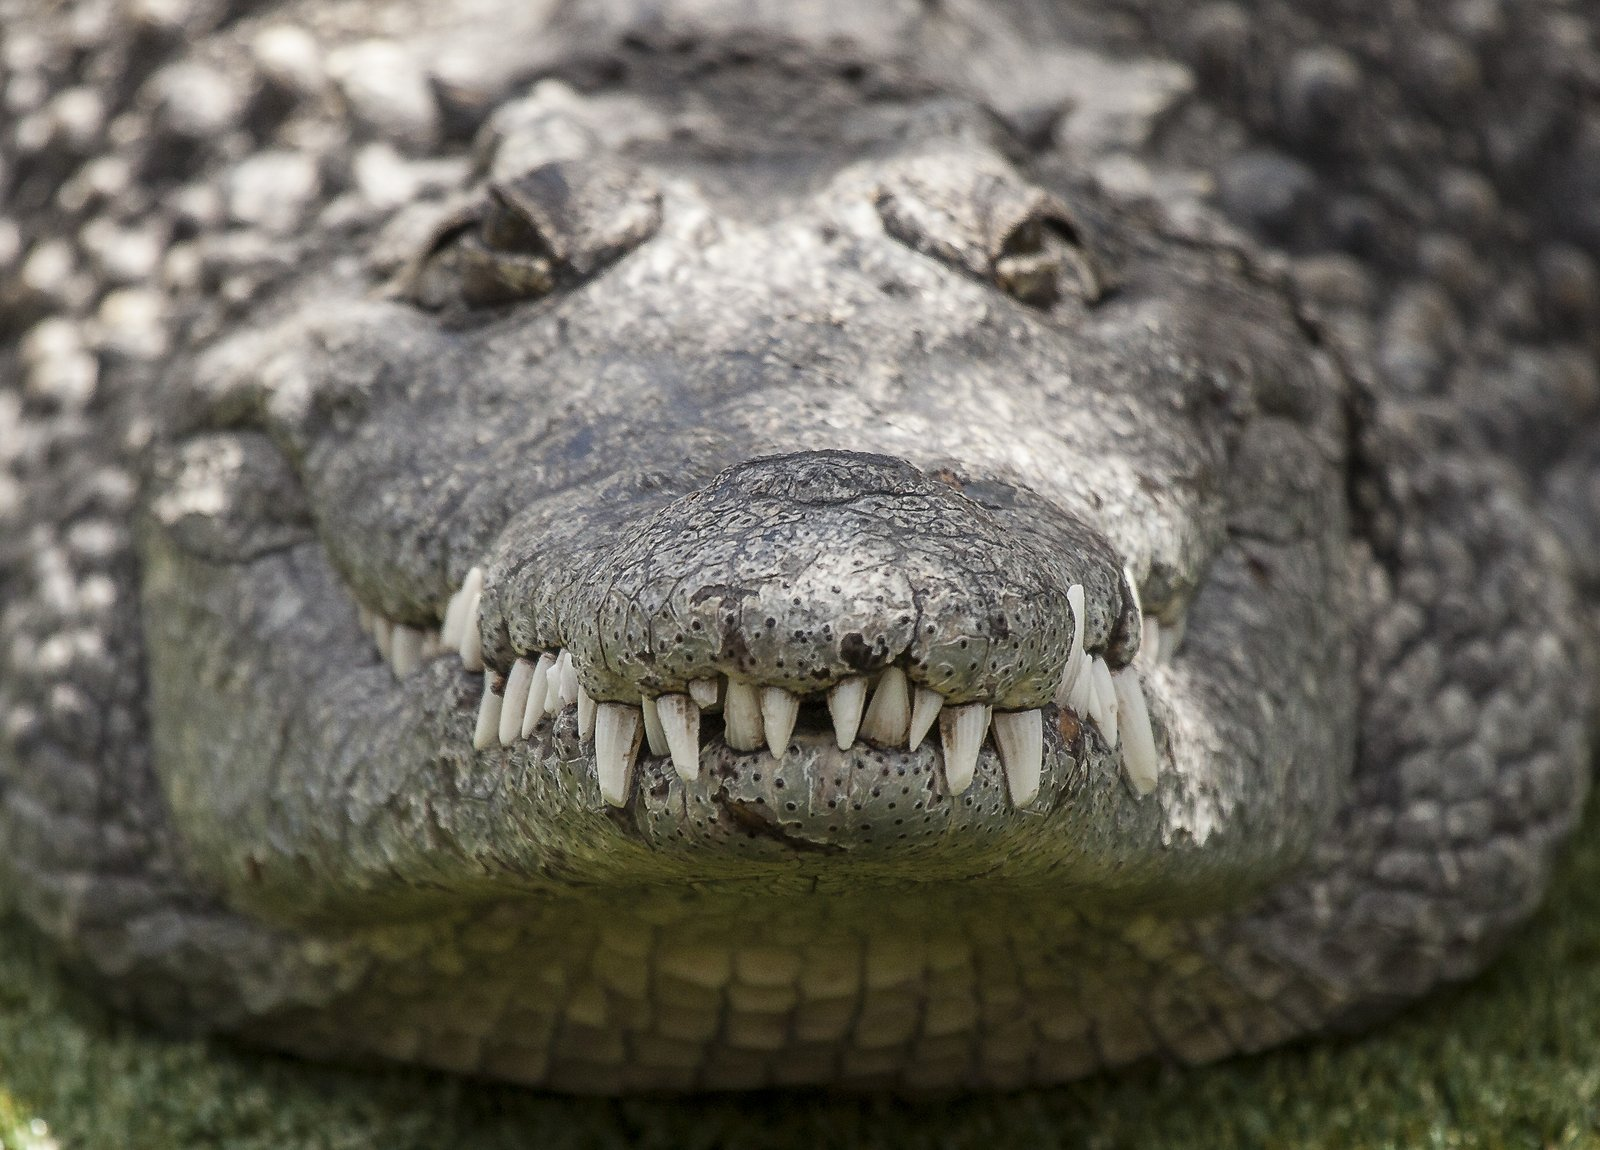 Ronnewby Alligators Reptile Gardens Rapid City South Dakota May 2012